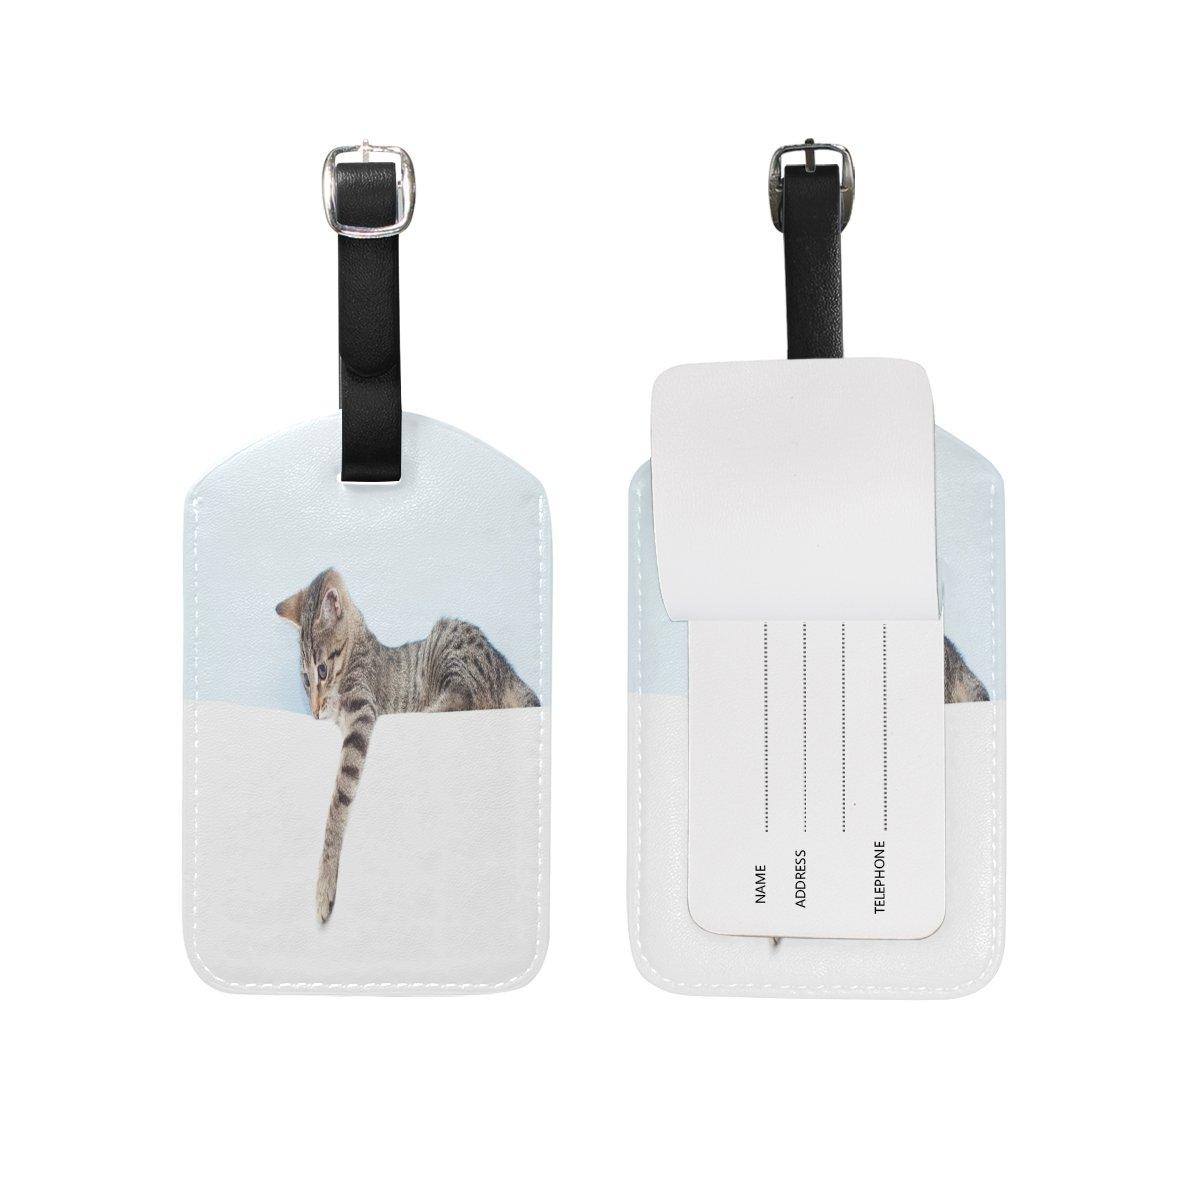 1Pcs Saobao Travel Luggage Tag Kitten Hold White Sheet PU Leather Baggage Suitcase Travel ID Bag Tag